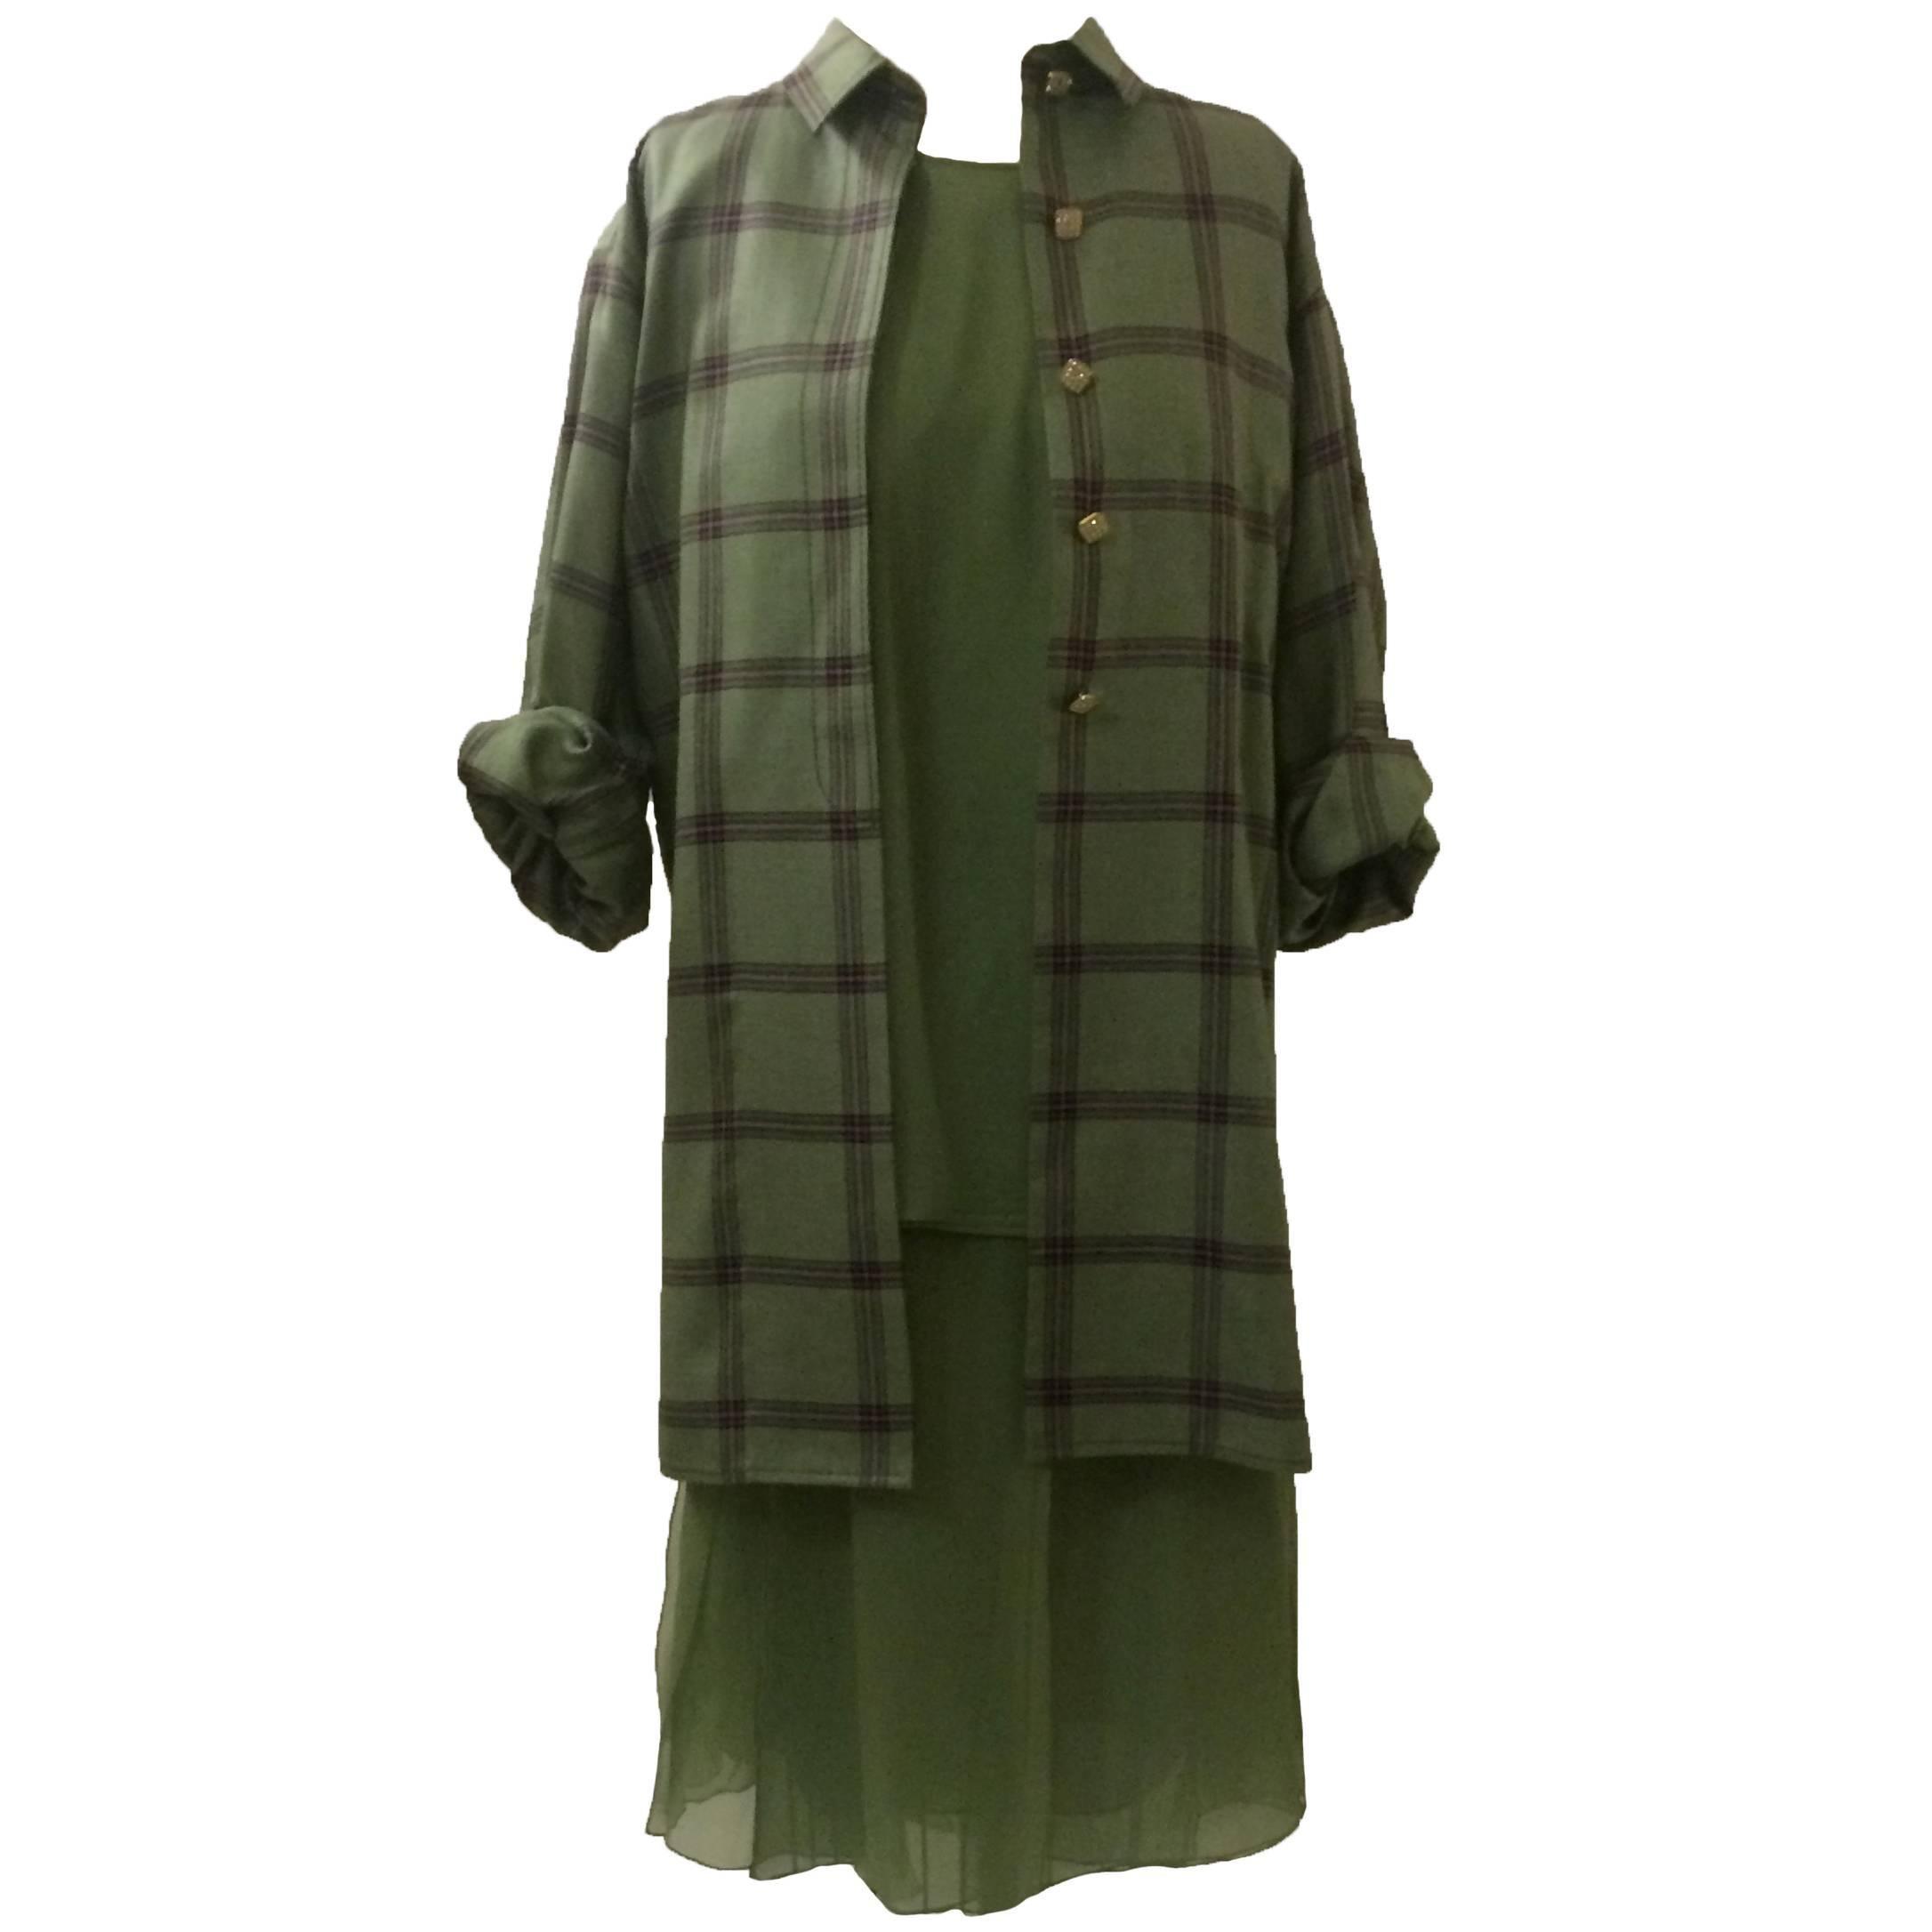 James Galanos Three Piece Green Plaid Chiffon Suit Jacket Skirt Top, 1990s